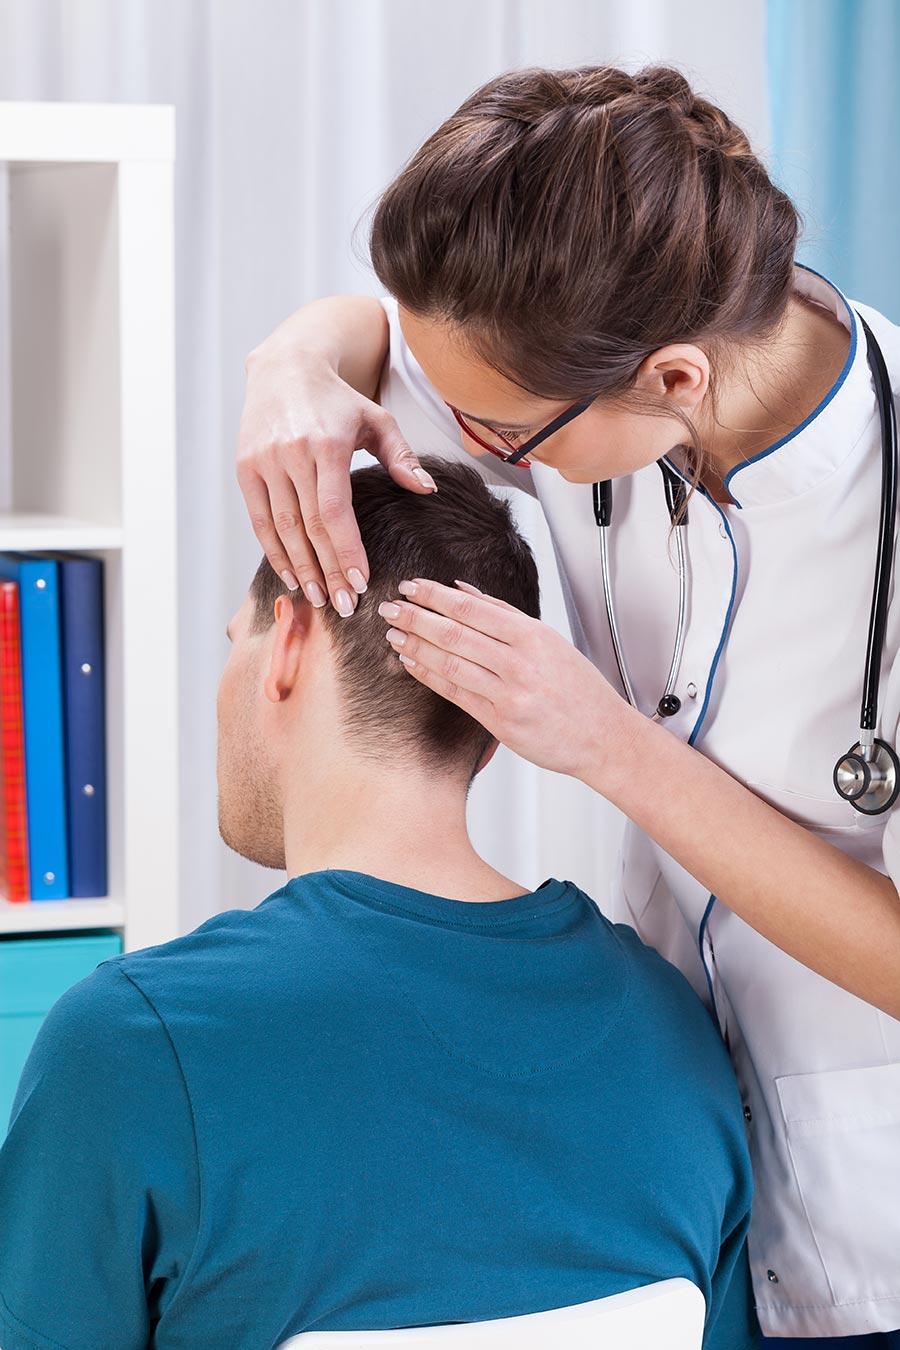 Alopecia treated by dermatologists